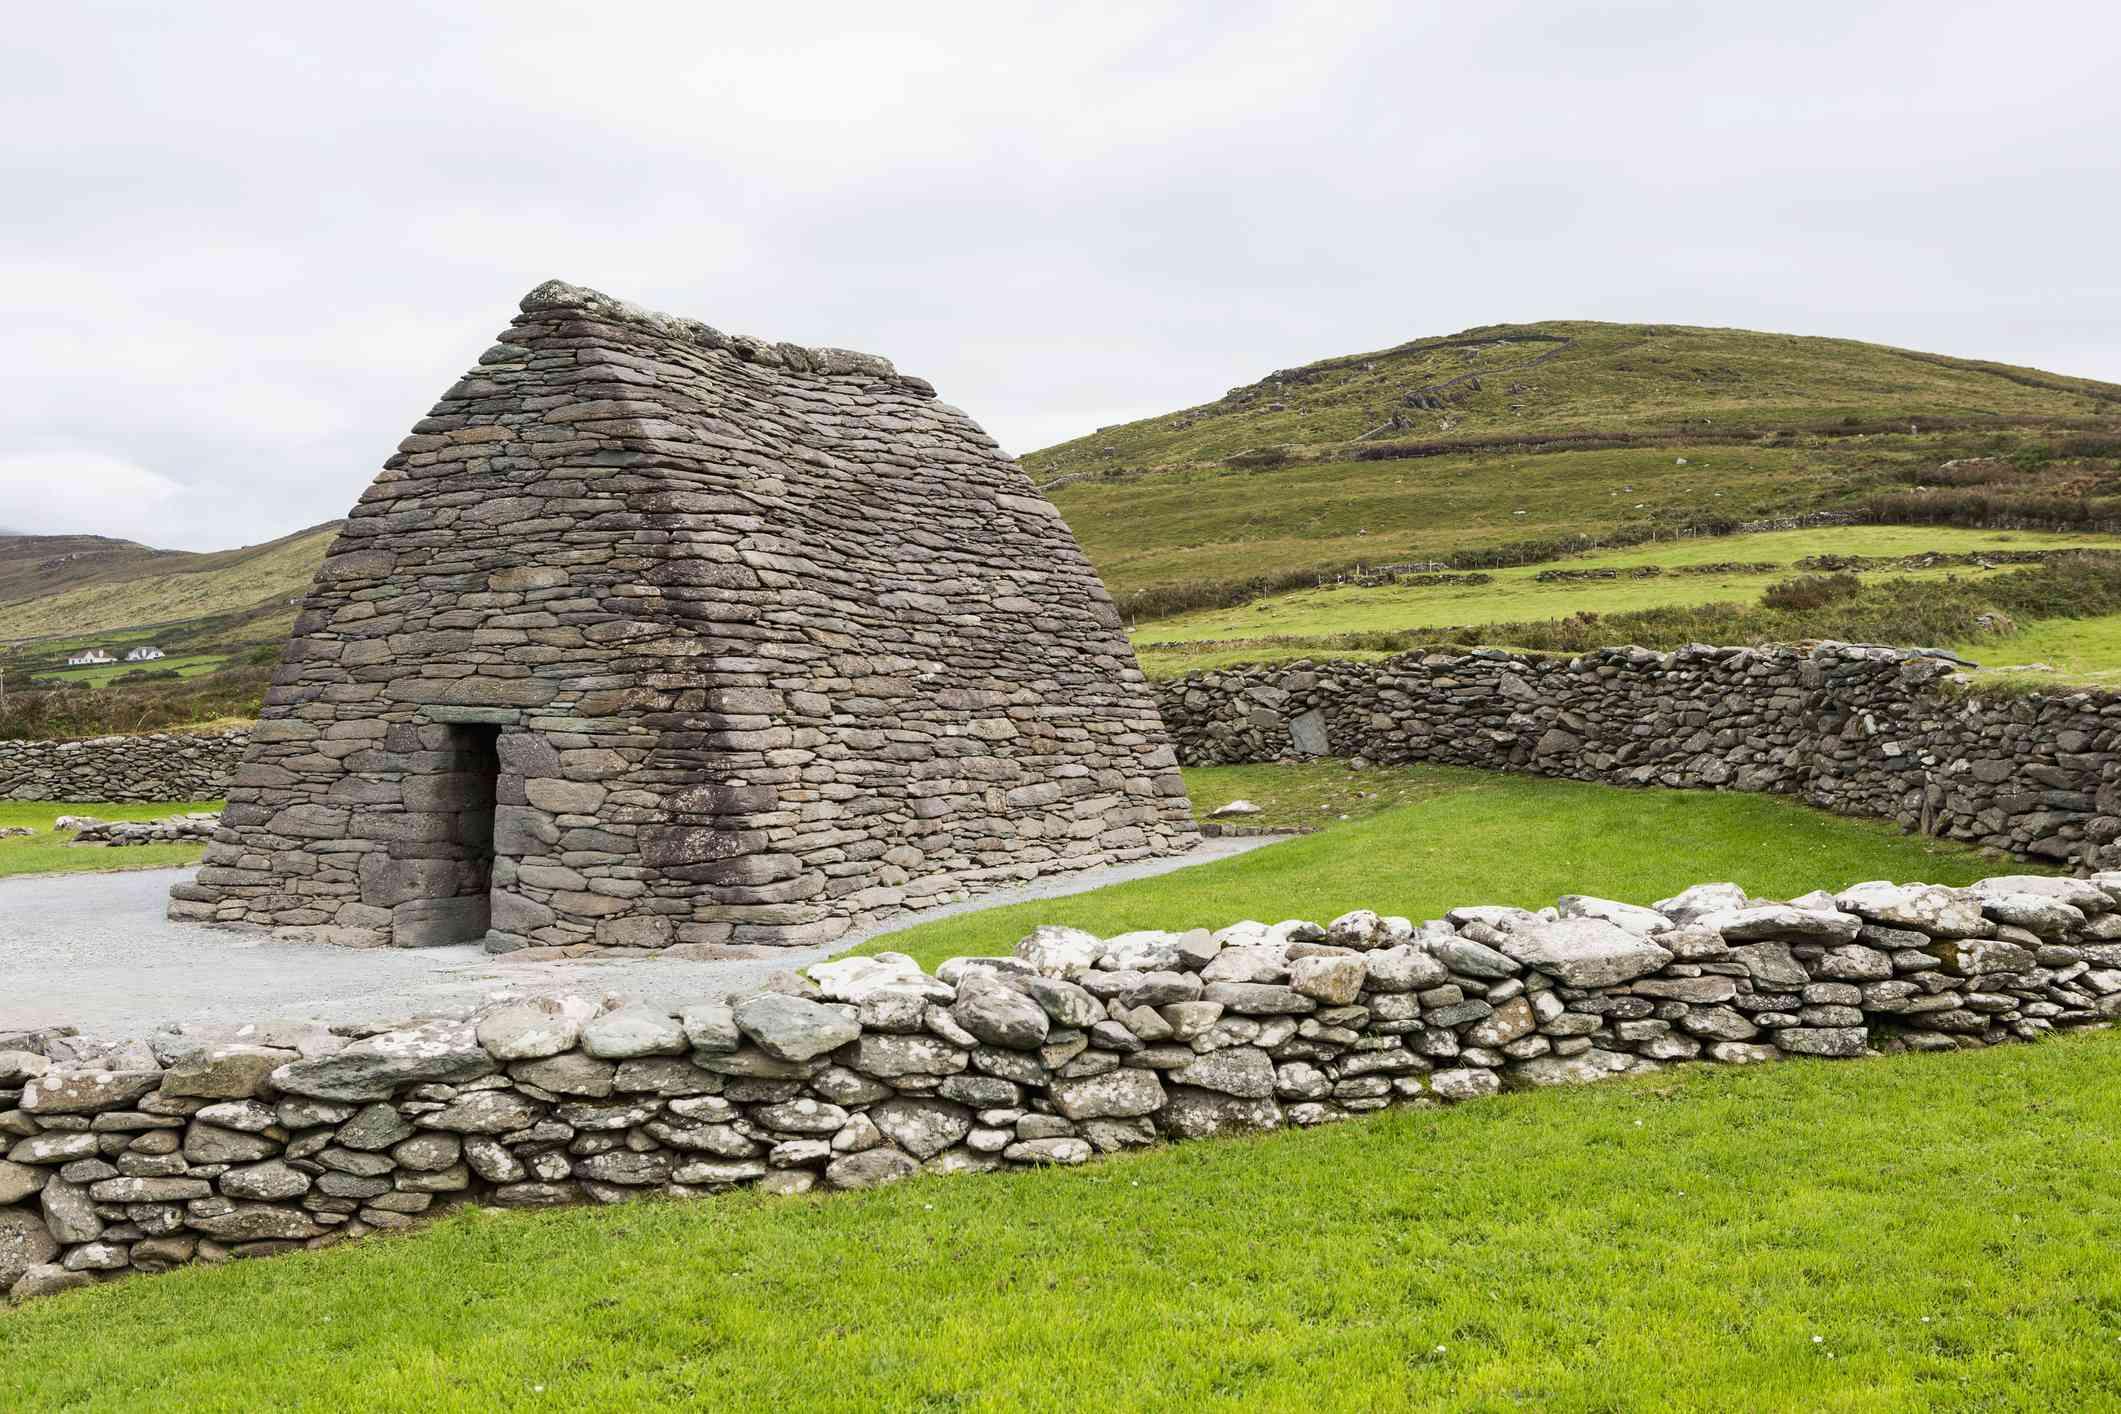 Gallarus Oratory stone church against green hills in Ireland